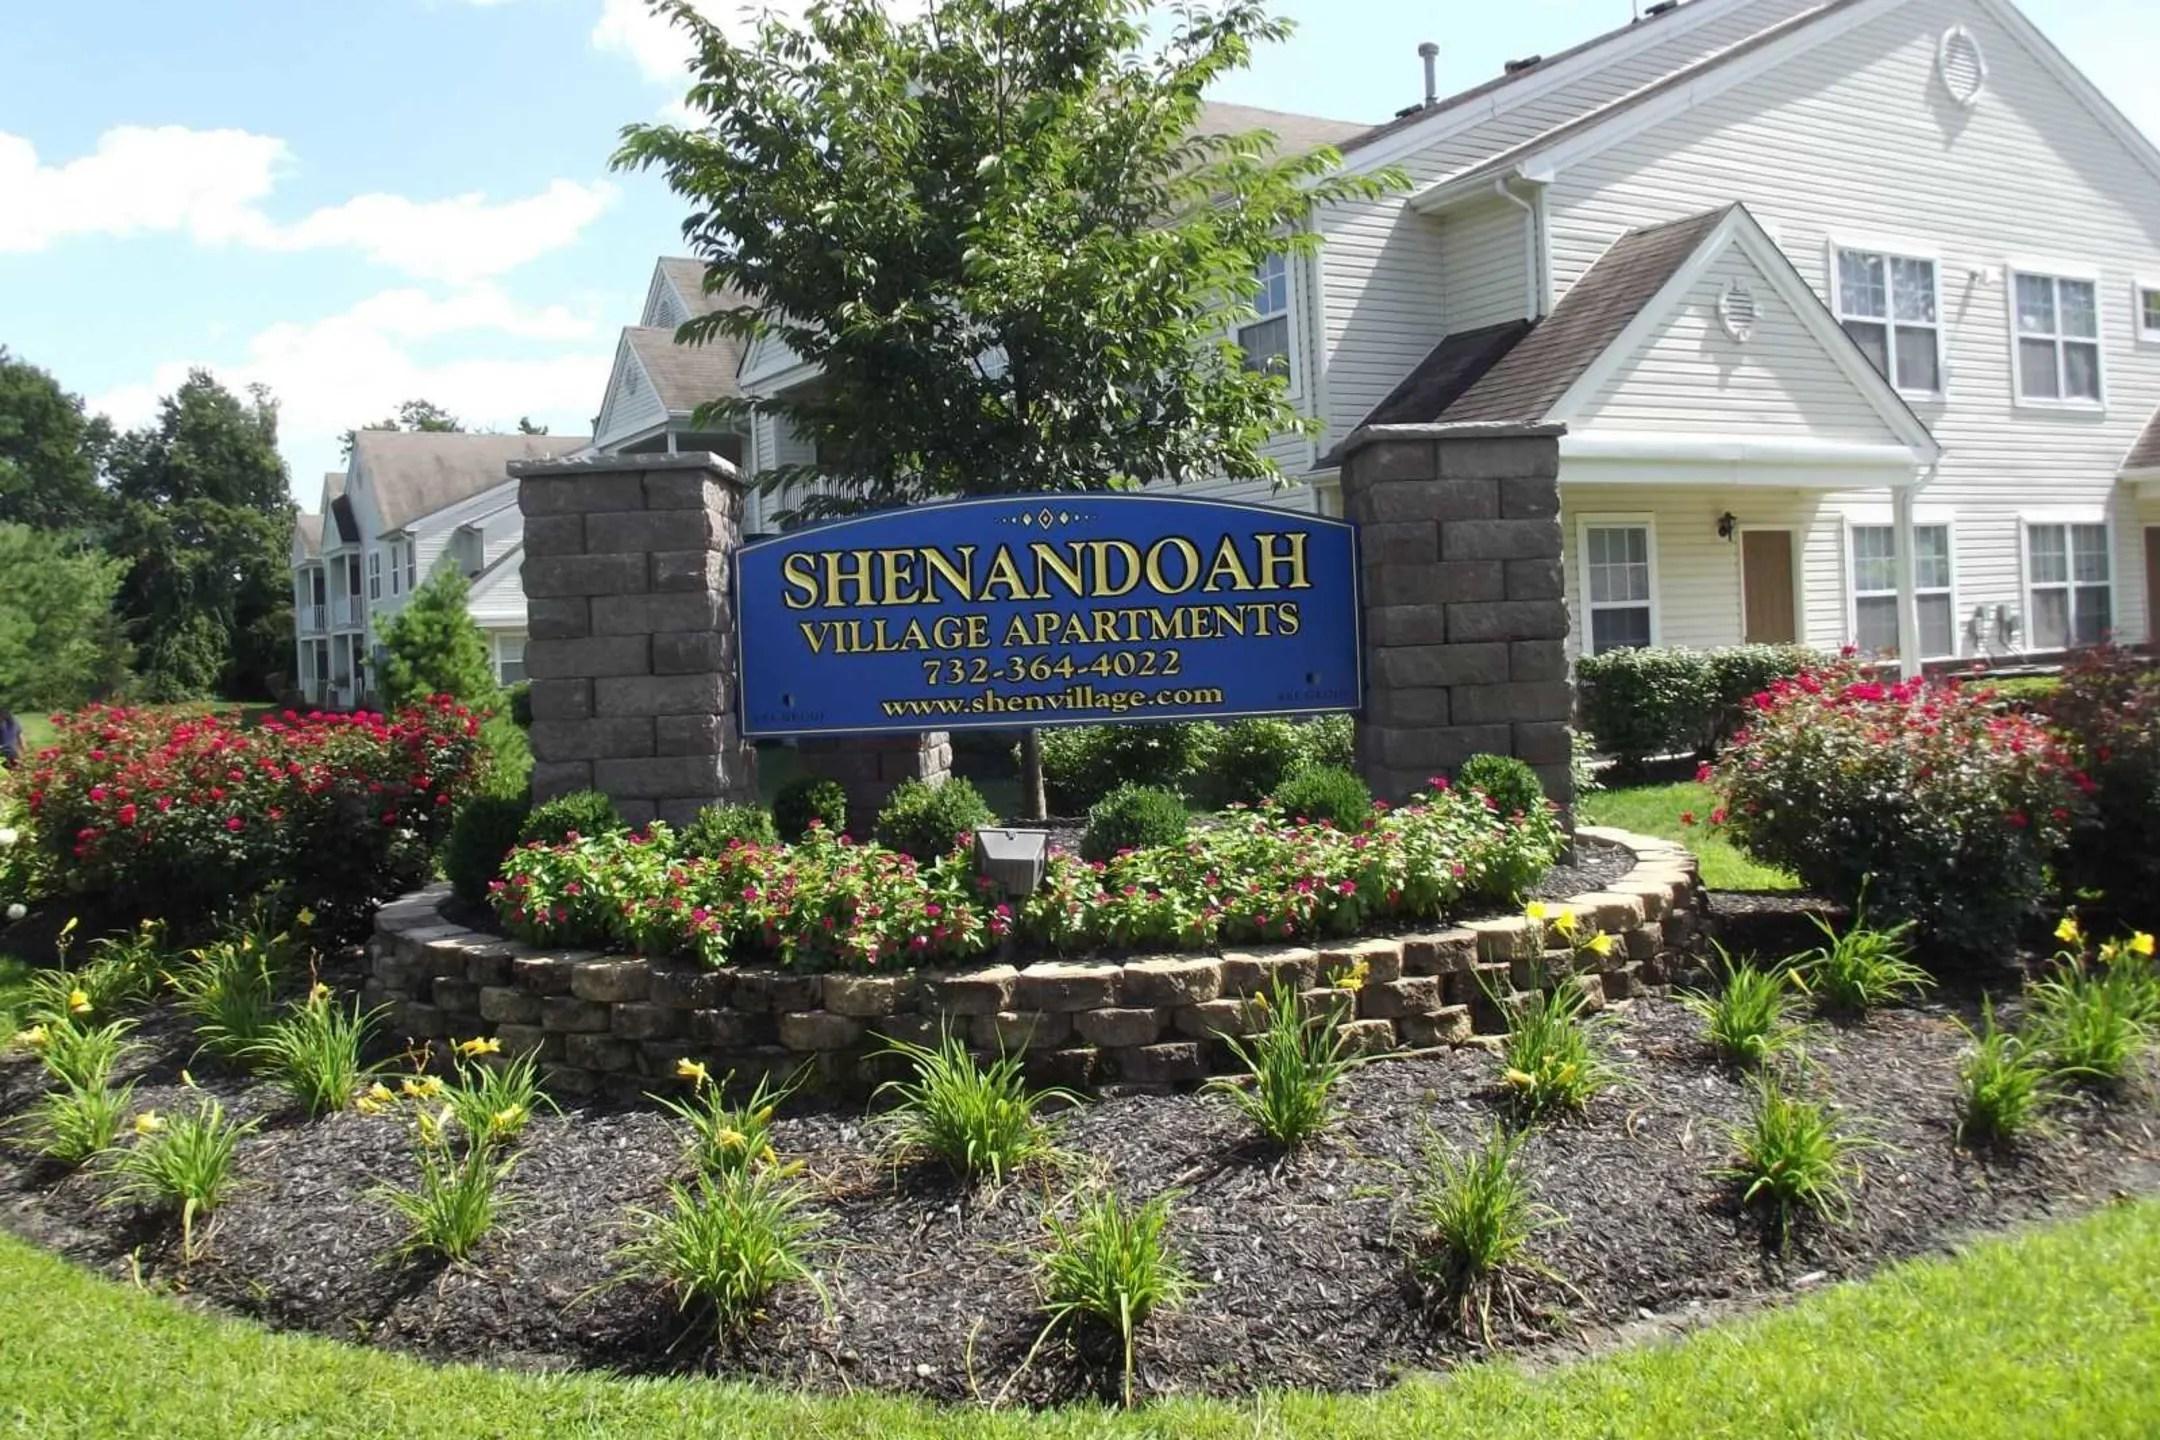 Shenandoah Village Apartments  Lakewood NJ 08701